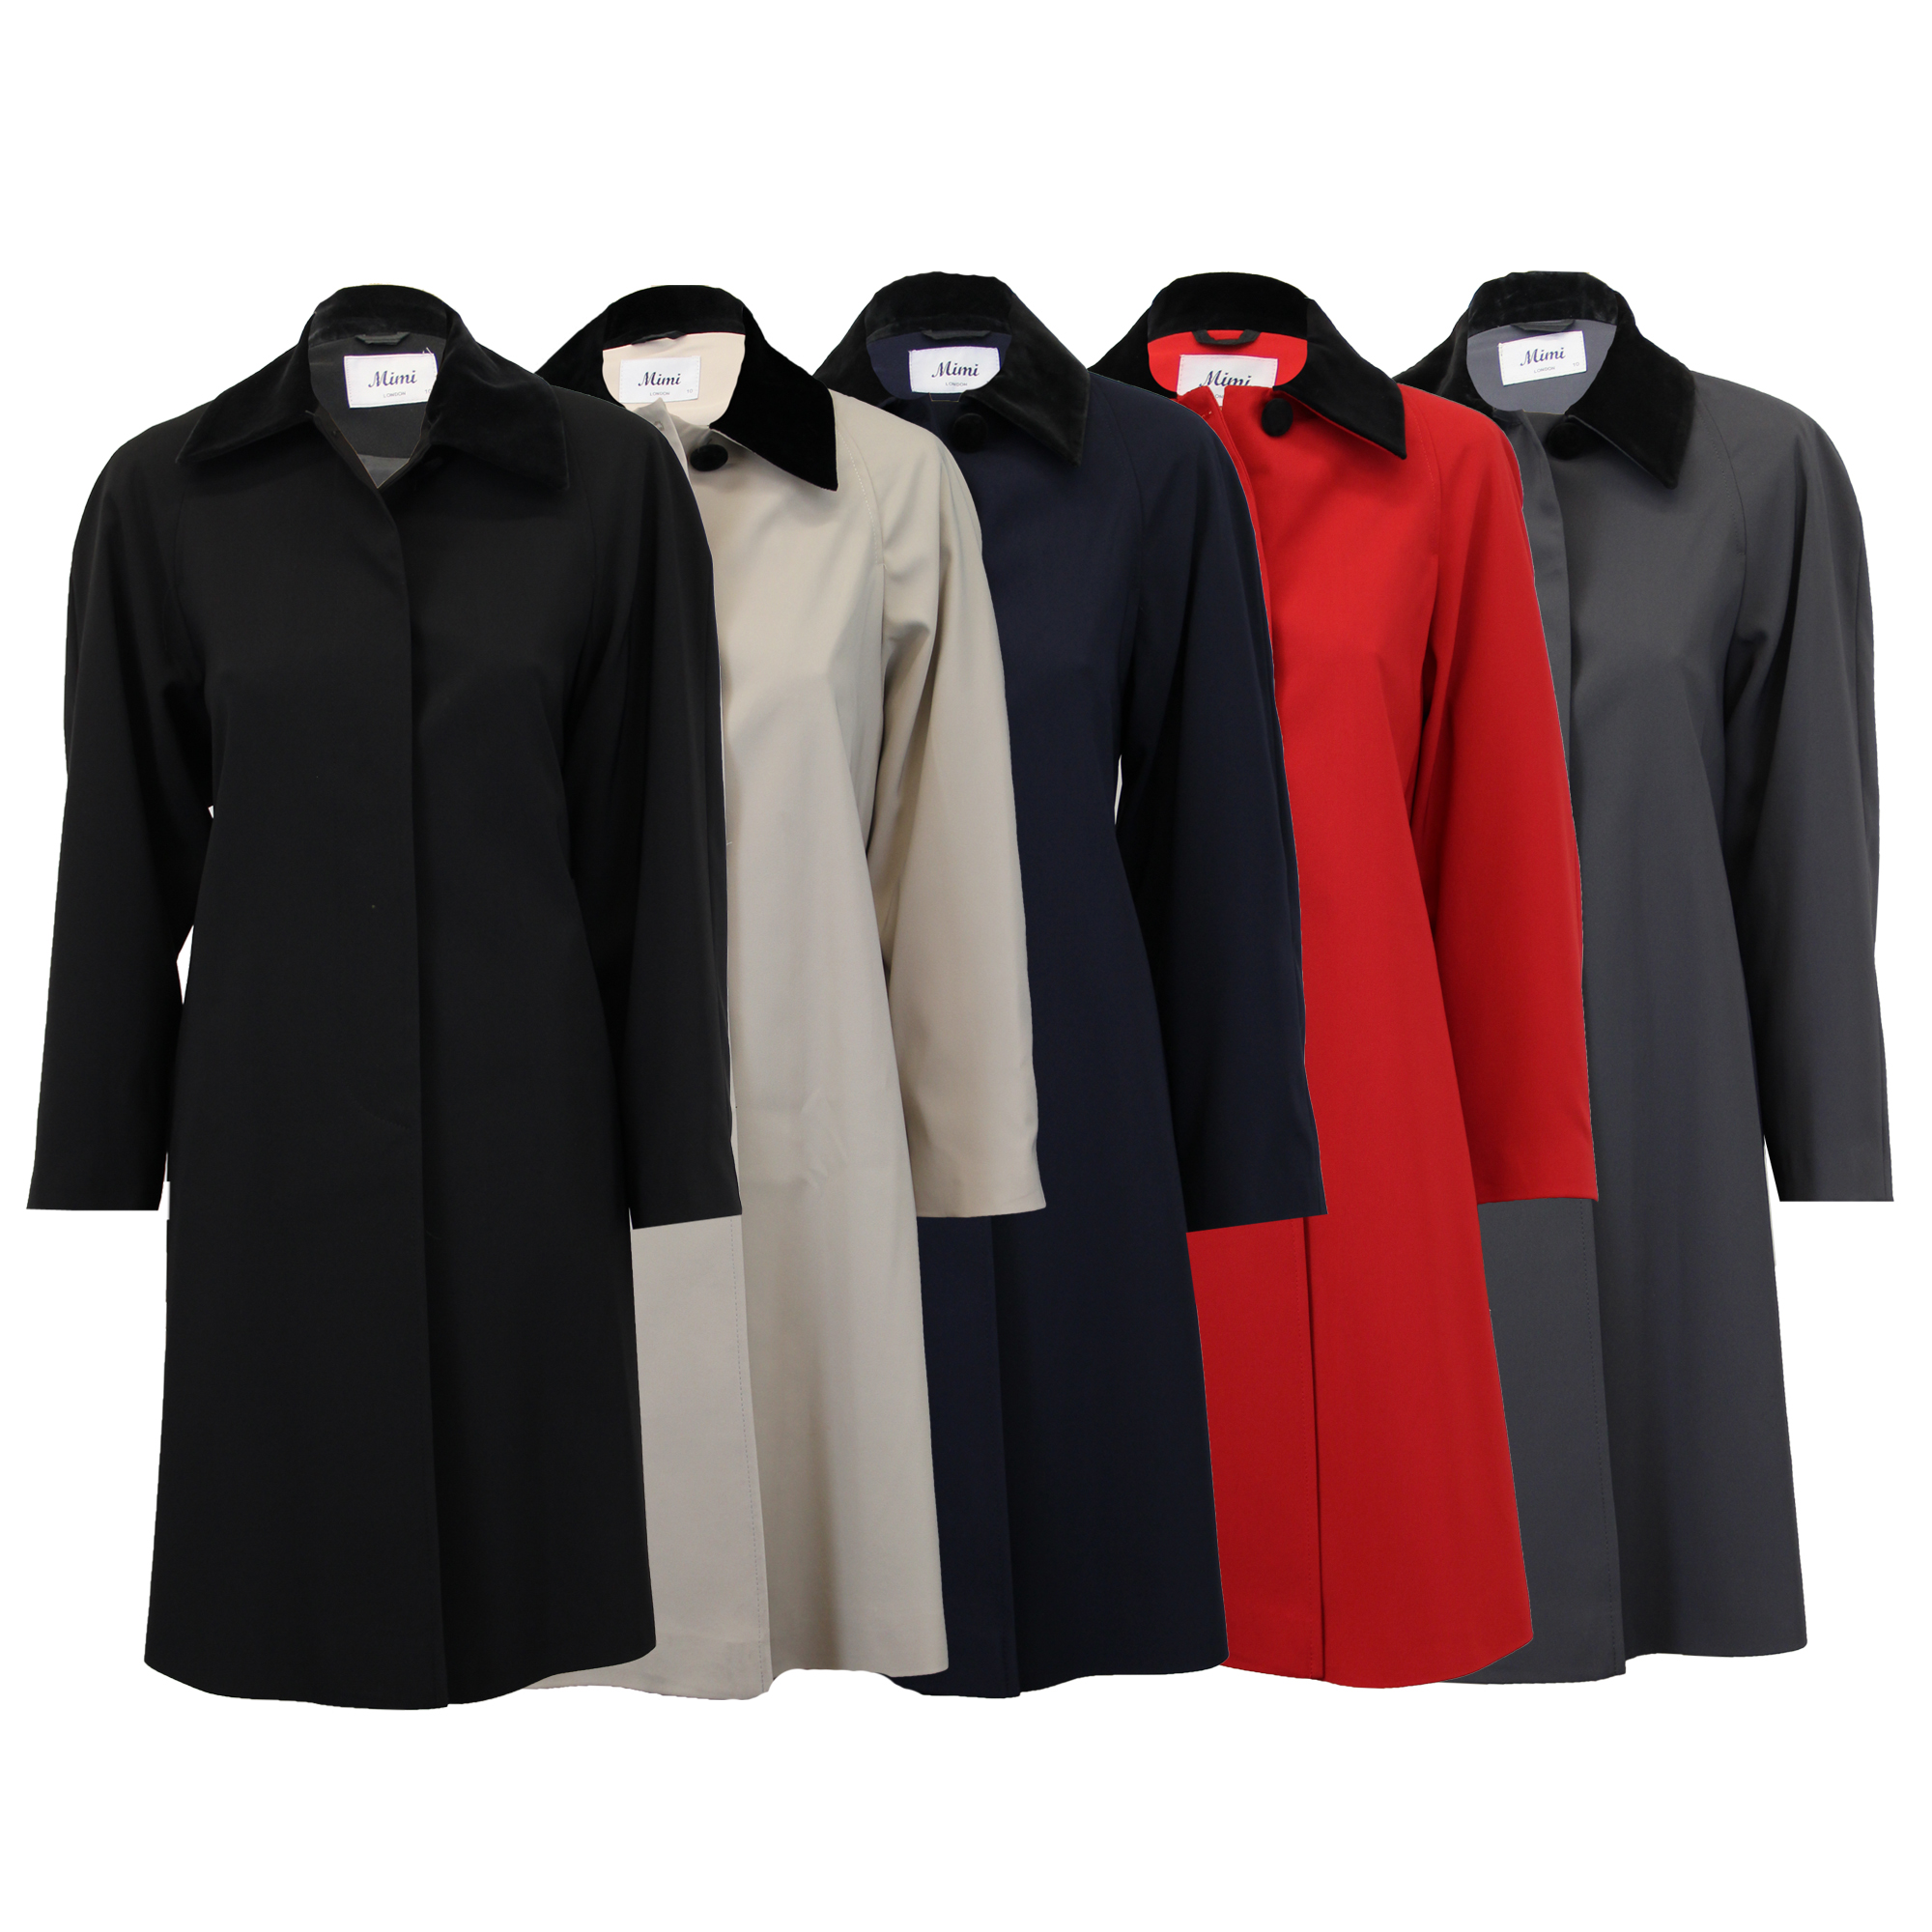 Ladies-Coat-Womens-Jacket-Trench-Overcoat-Velvet-Collar-Long-Casual-Lined-Summer thumbnail 4